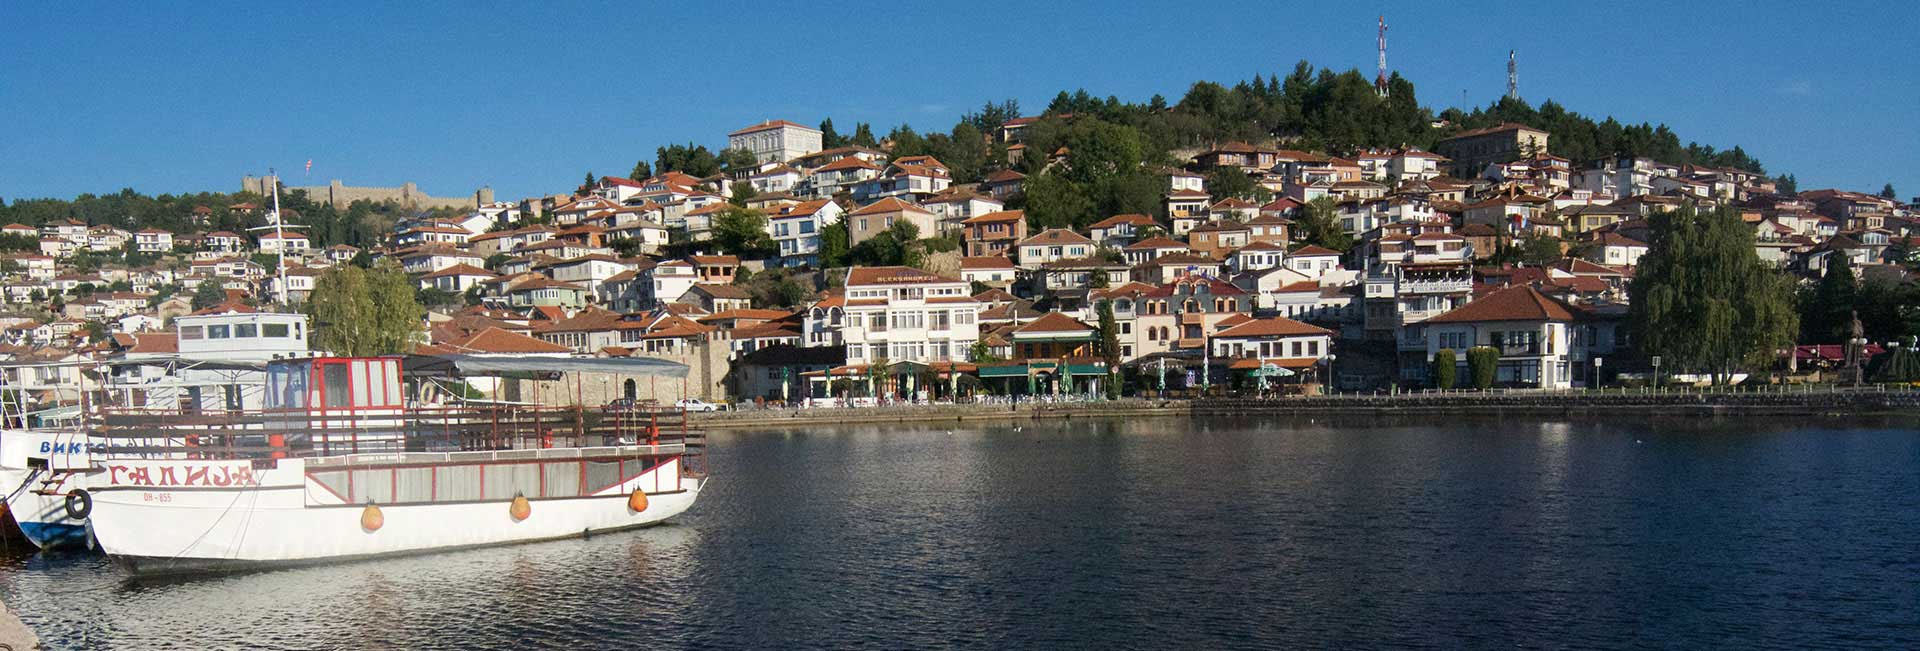 Balkan coast. Photo credit: Peter Guttman